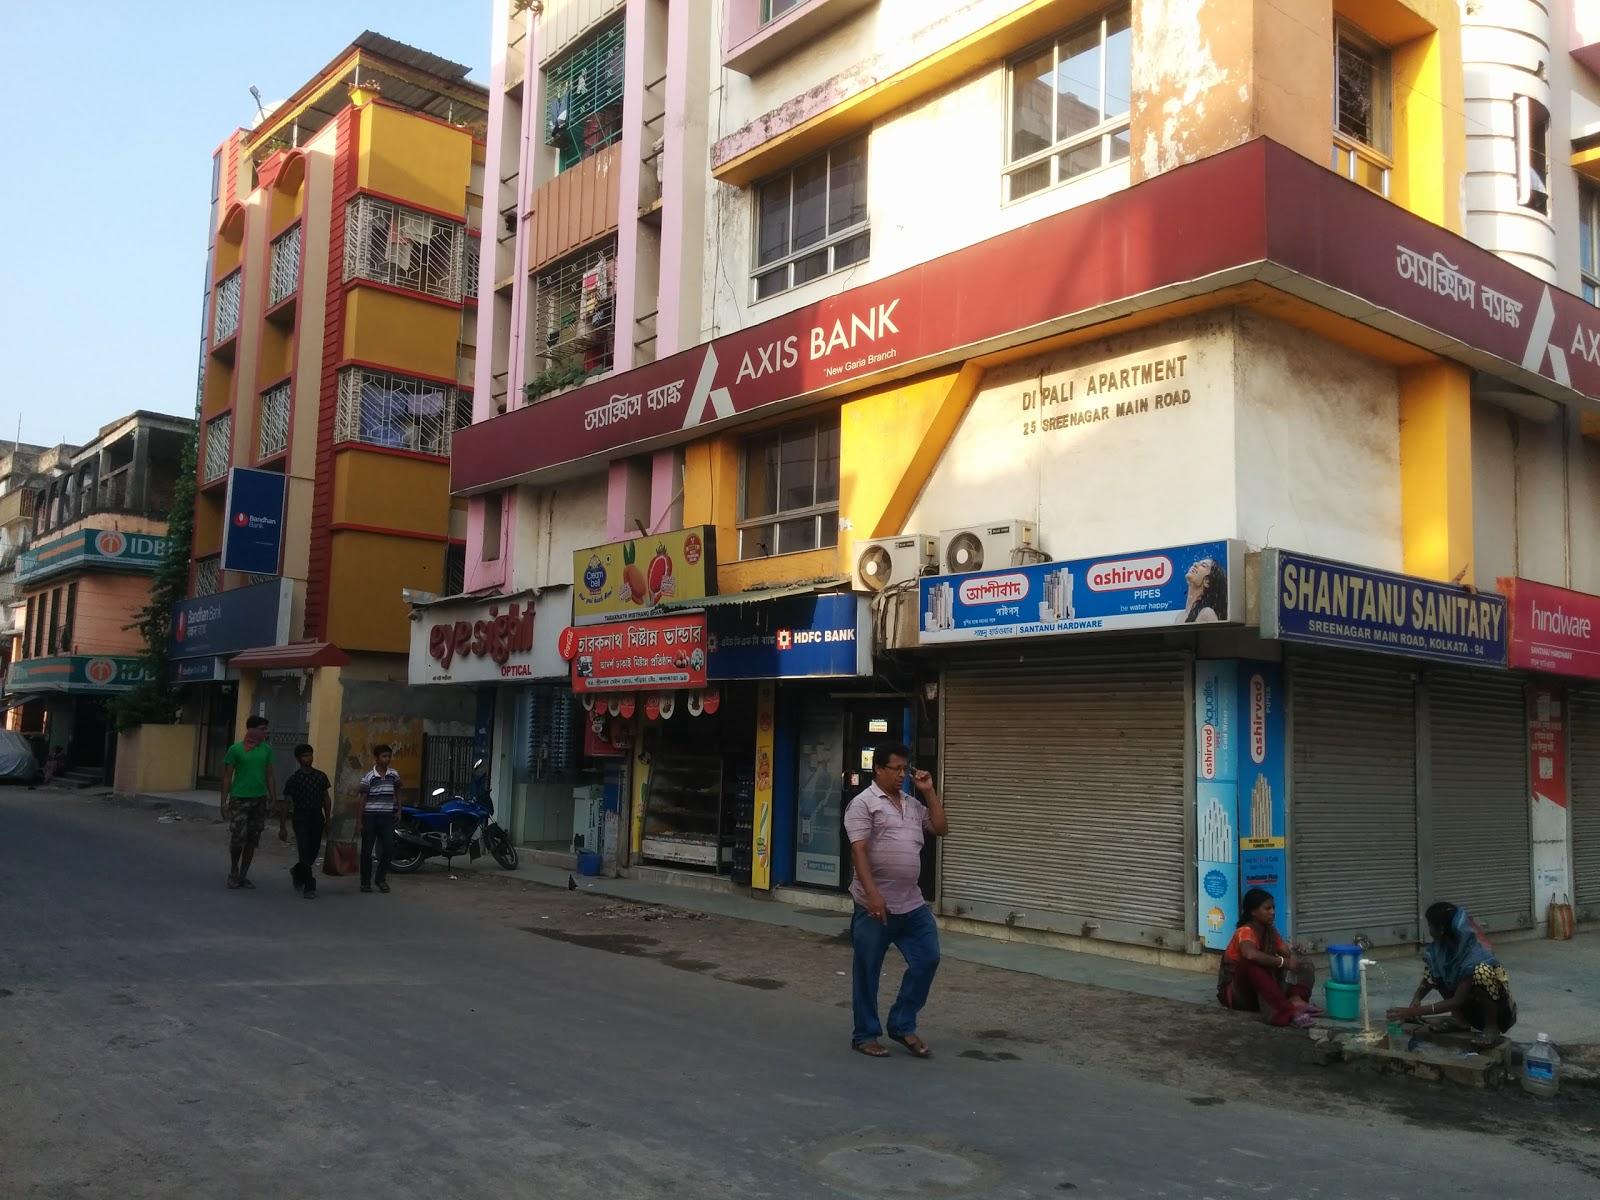 blood bank Axis Bank near Kolkata West Bengal